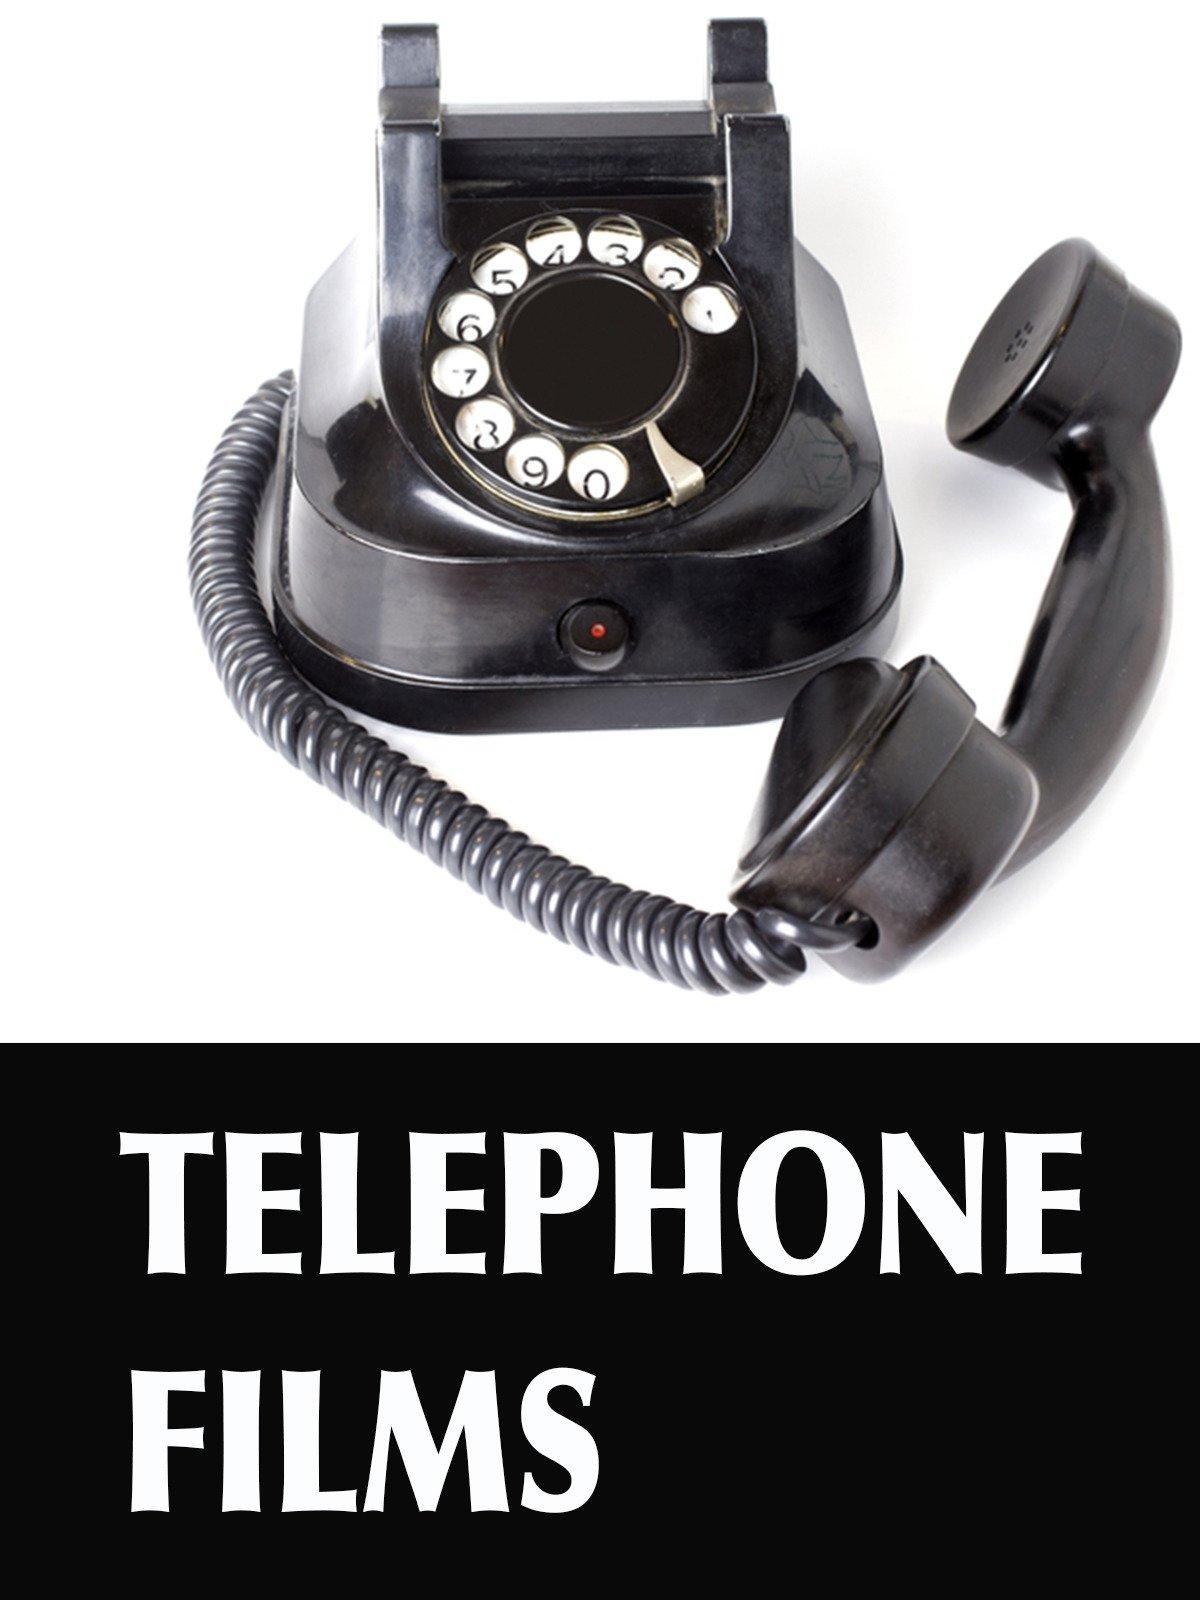 Telephone Films